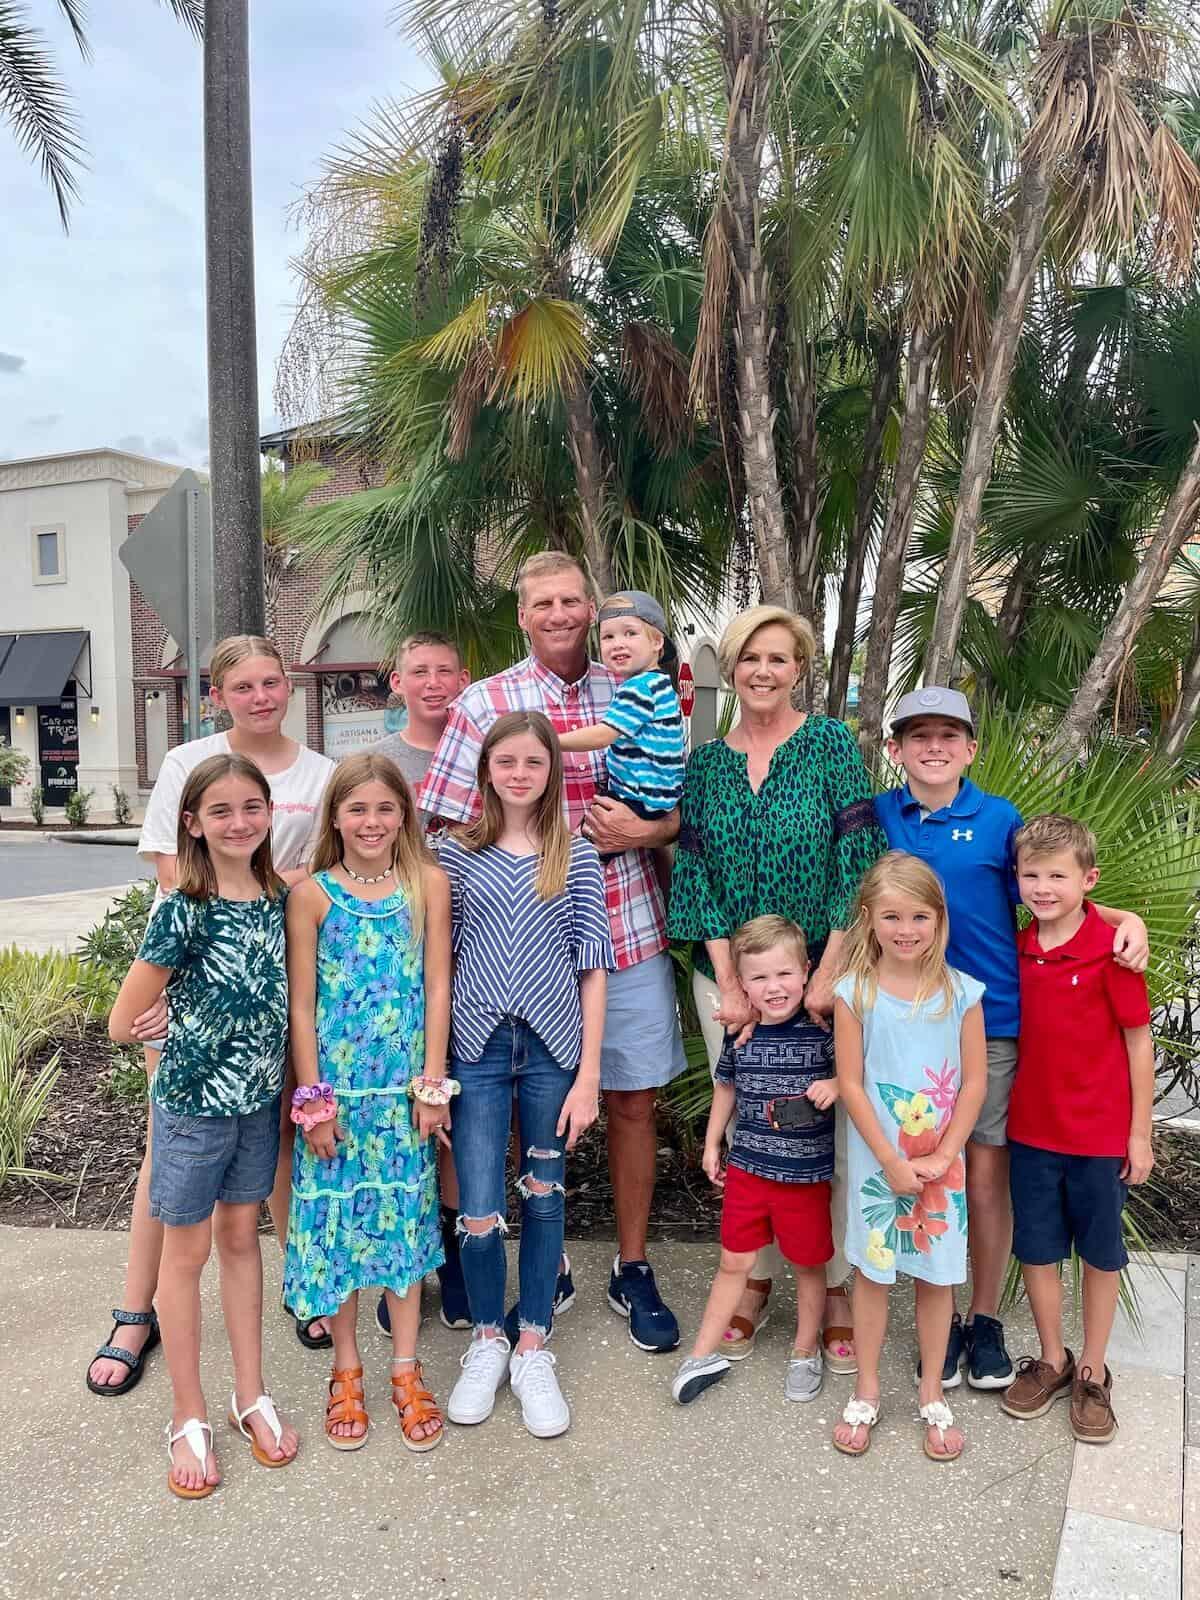 Parker Family Trip to Orlando: June 2021